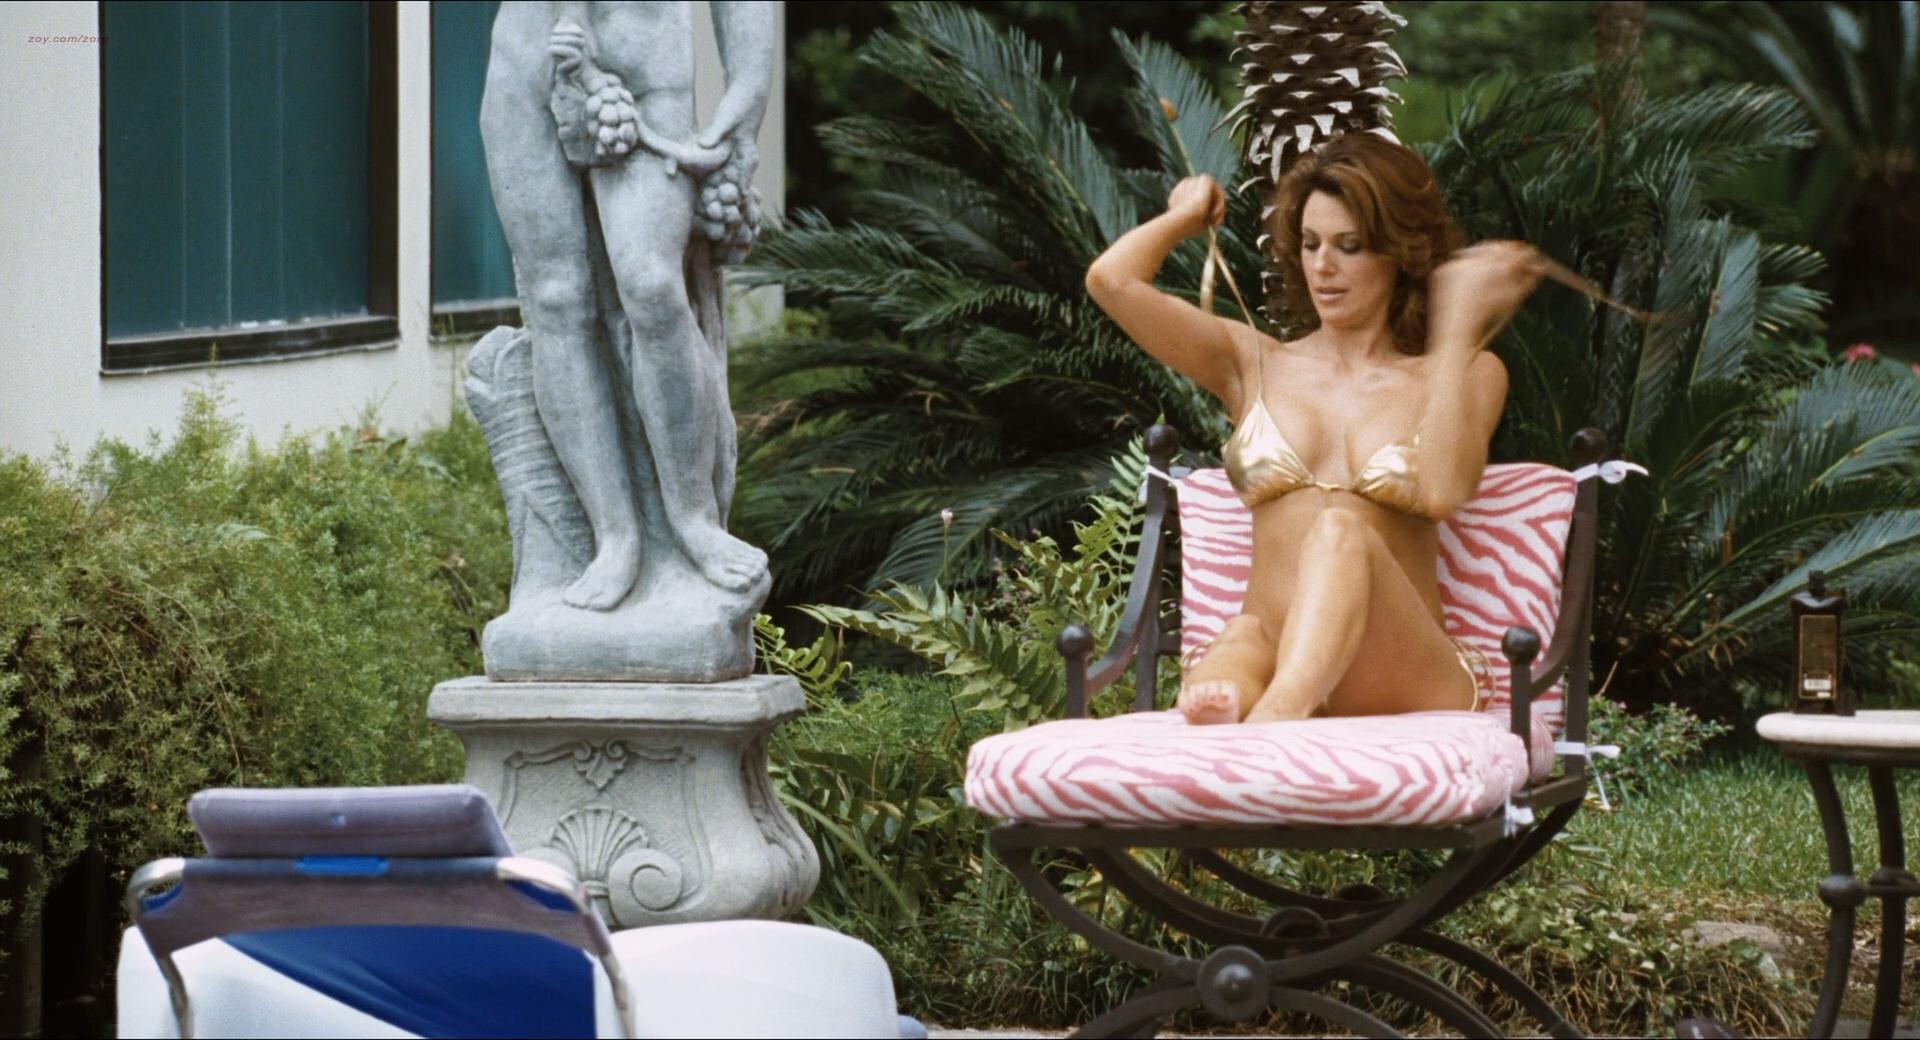 Simona fusco naked video porn pics & move